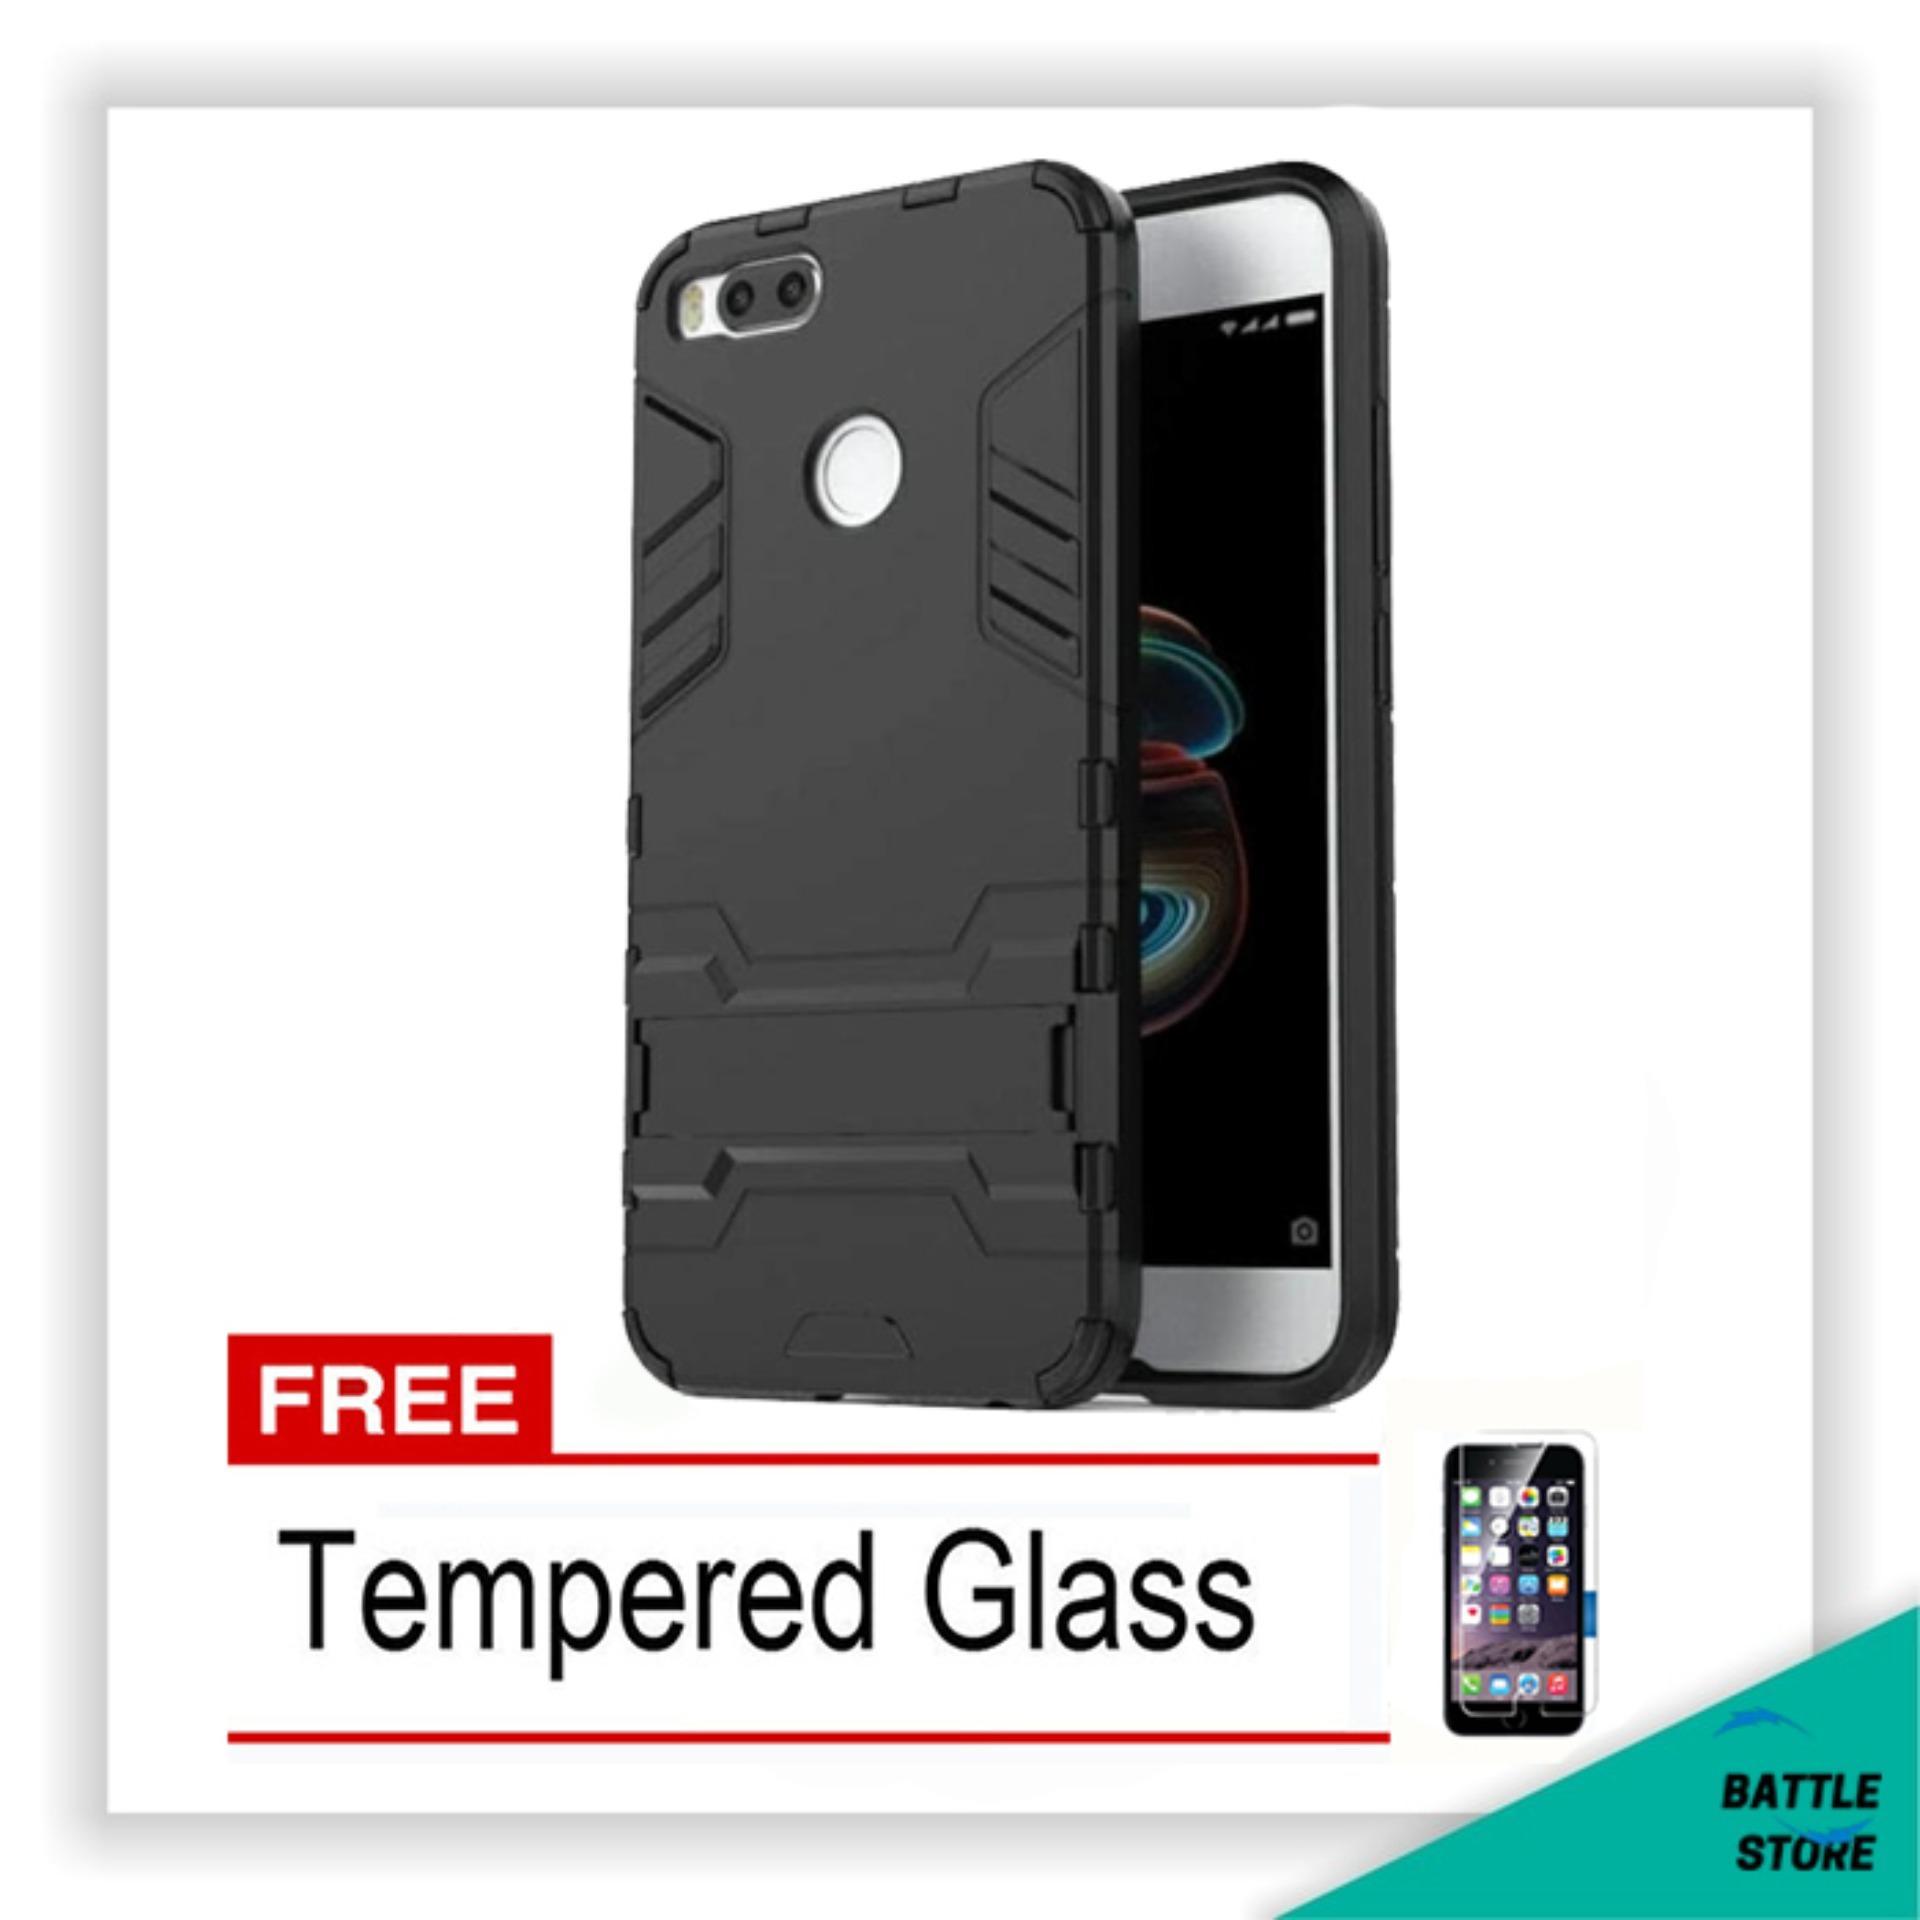 Melindungi Gadget Dari Debu Dan Benturan Back Case Xiaomi Mi A1 MiA1 Iron Man Robot Transformer Ironman Limited + Free Tempered Glass